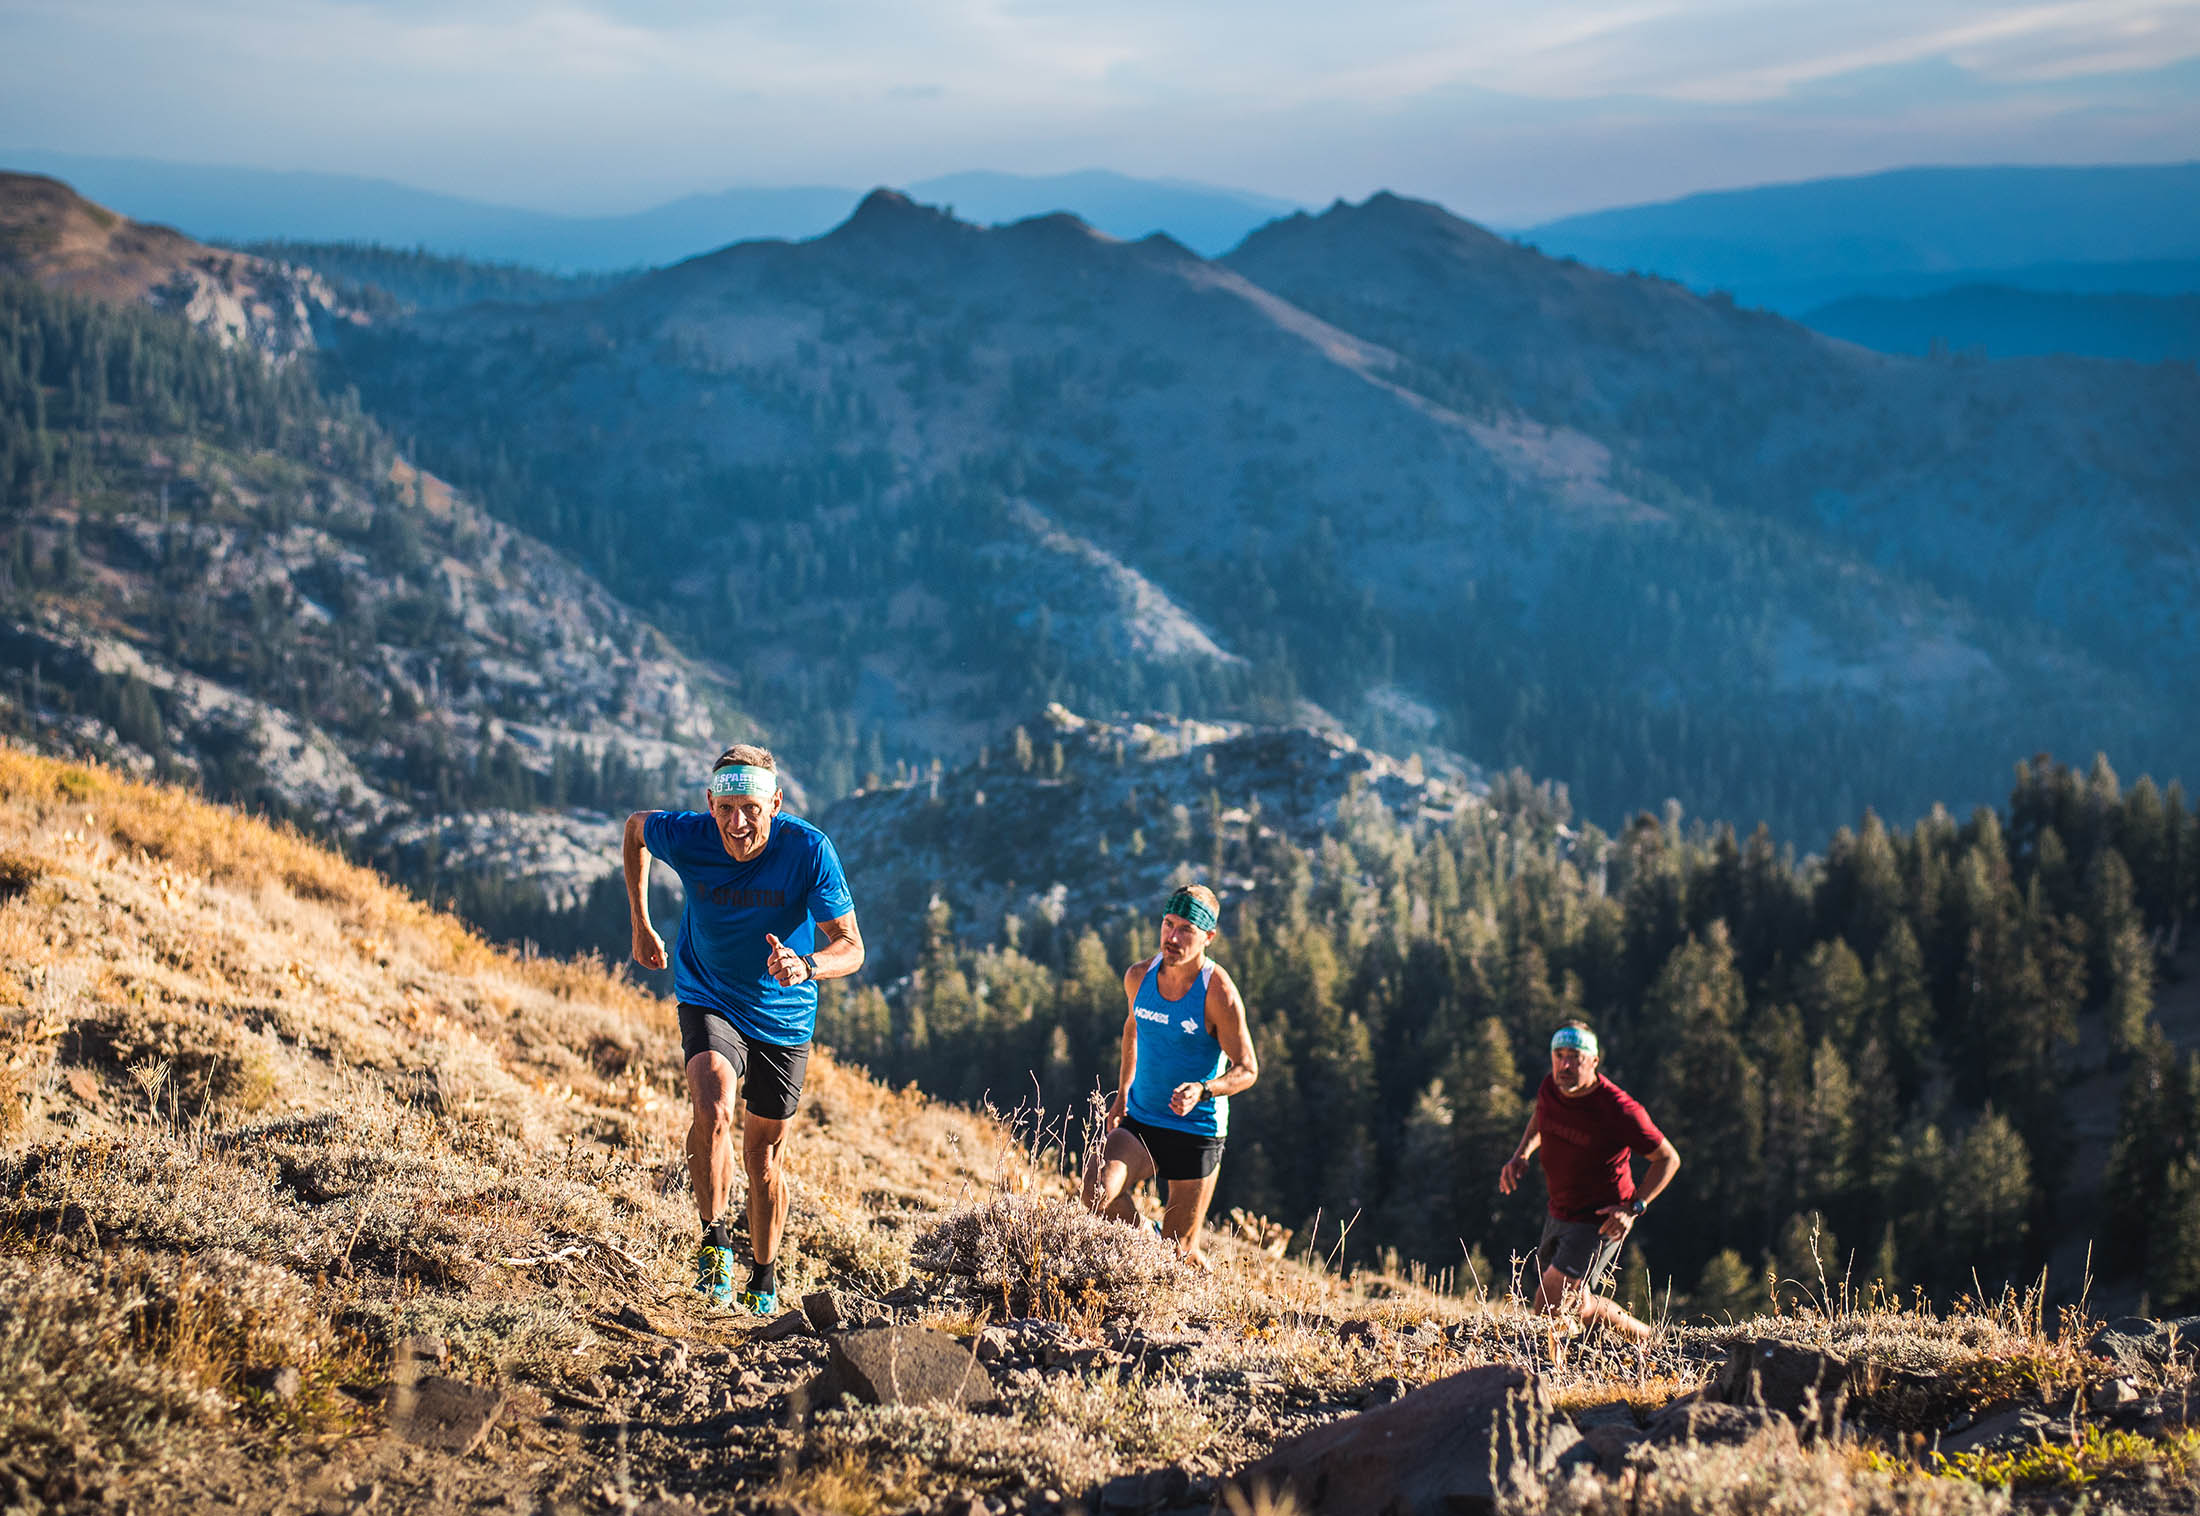 Spartan trail running